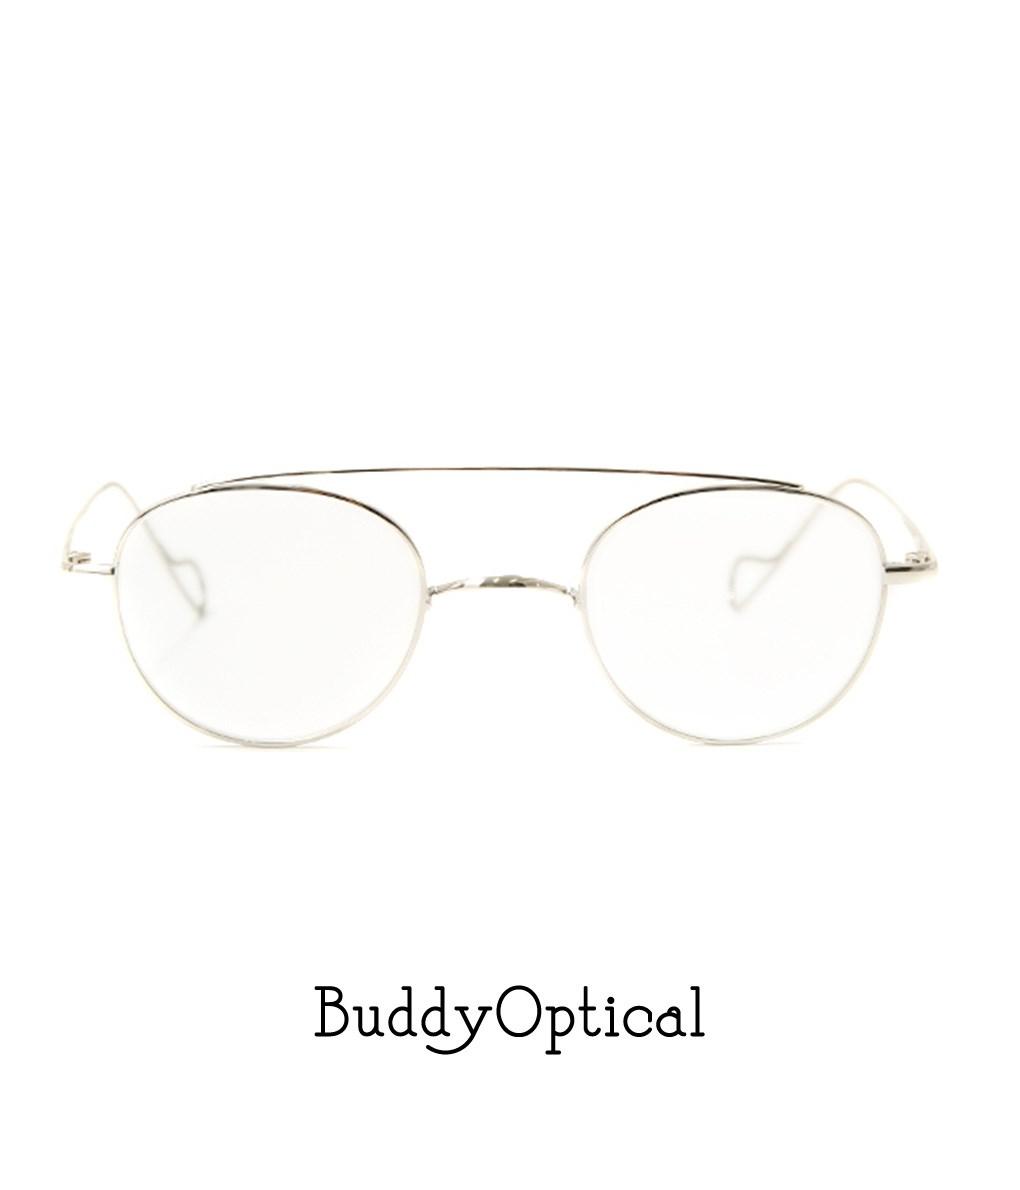 BuddyOptical / バディオプティカル : his -silver- : his メガネ 眼鏡 アイウェアー シルバー メンズ レディース : BO-his-silver 【COR】